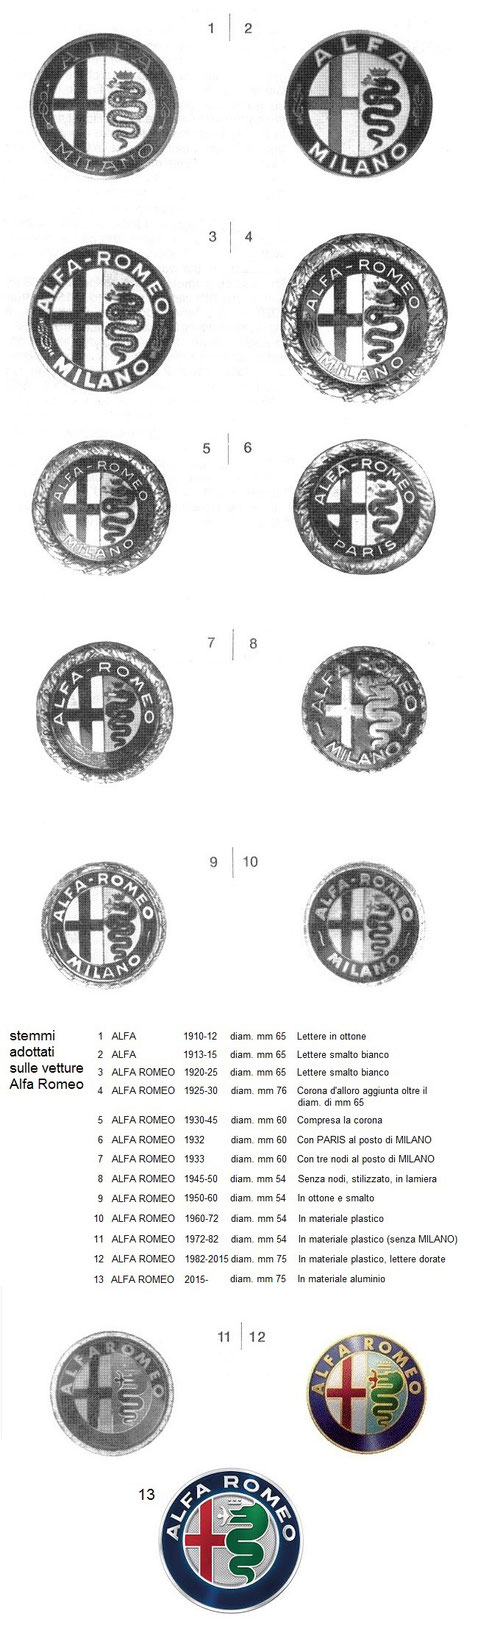 alfa logo emblem badge stemma storia Luigi Fusi alfa romeo, logo, badge, emblem, pin, pins, logos, badges, emblems, écusson, spilletta, spilla, stemma, medaglia, médaille, emblème, fregio, sigla, cloisonne, enamel, émaillé, smaltato